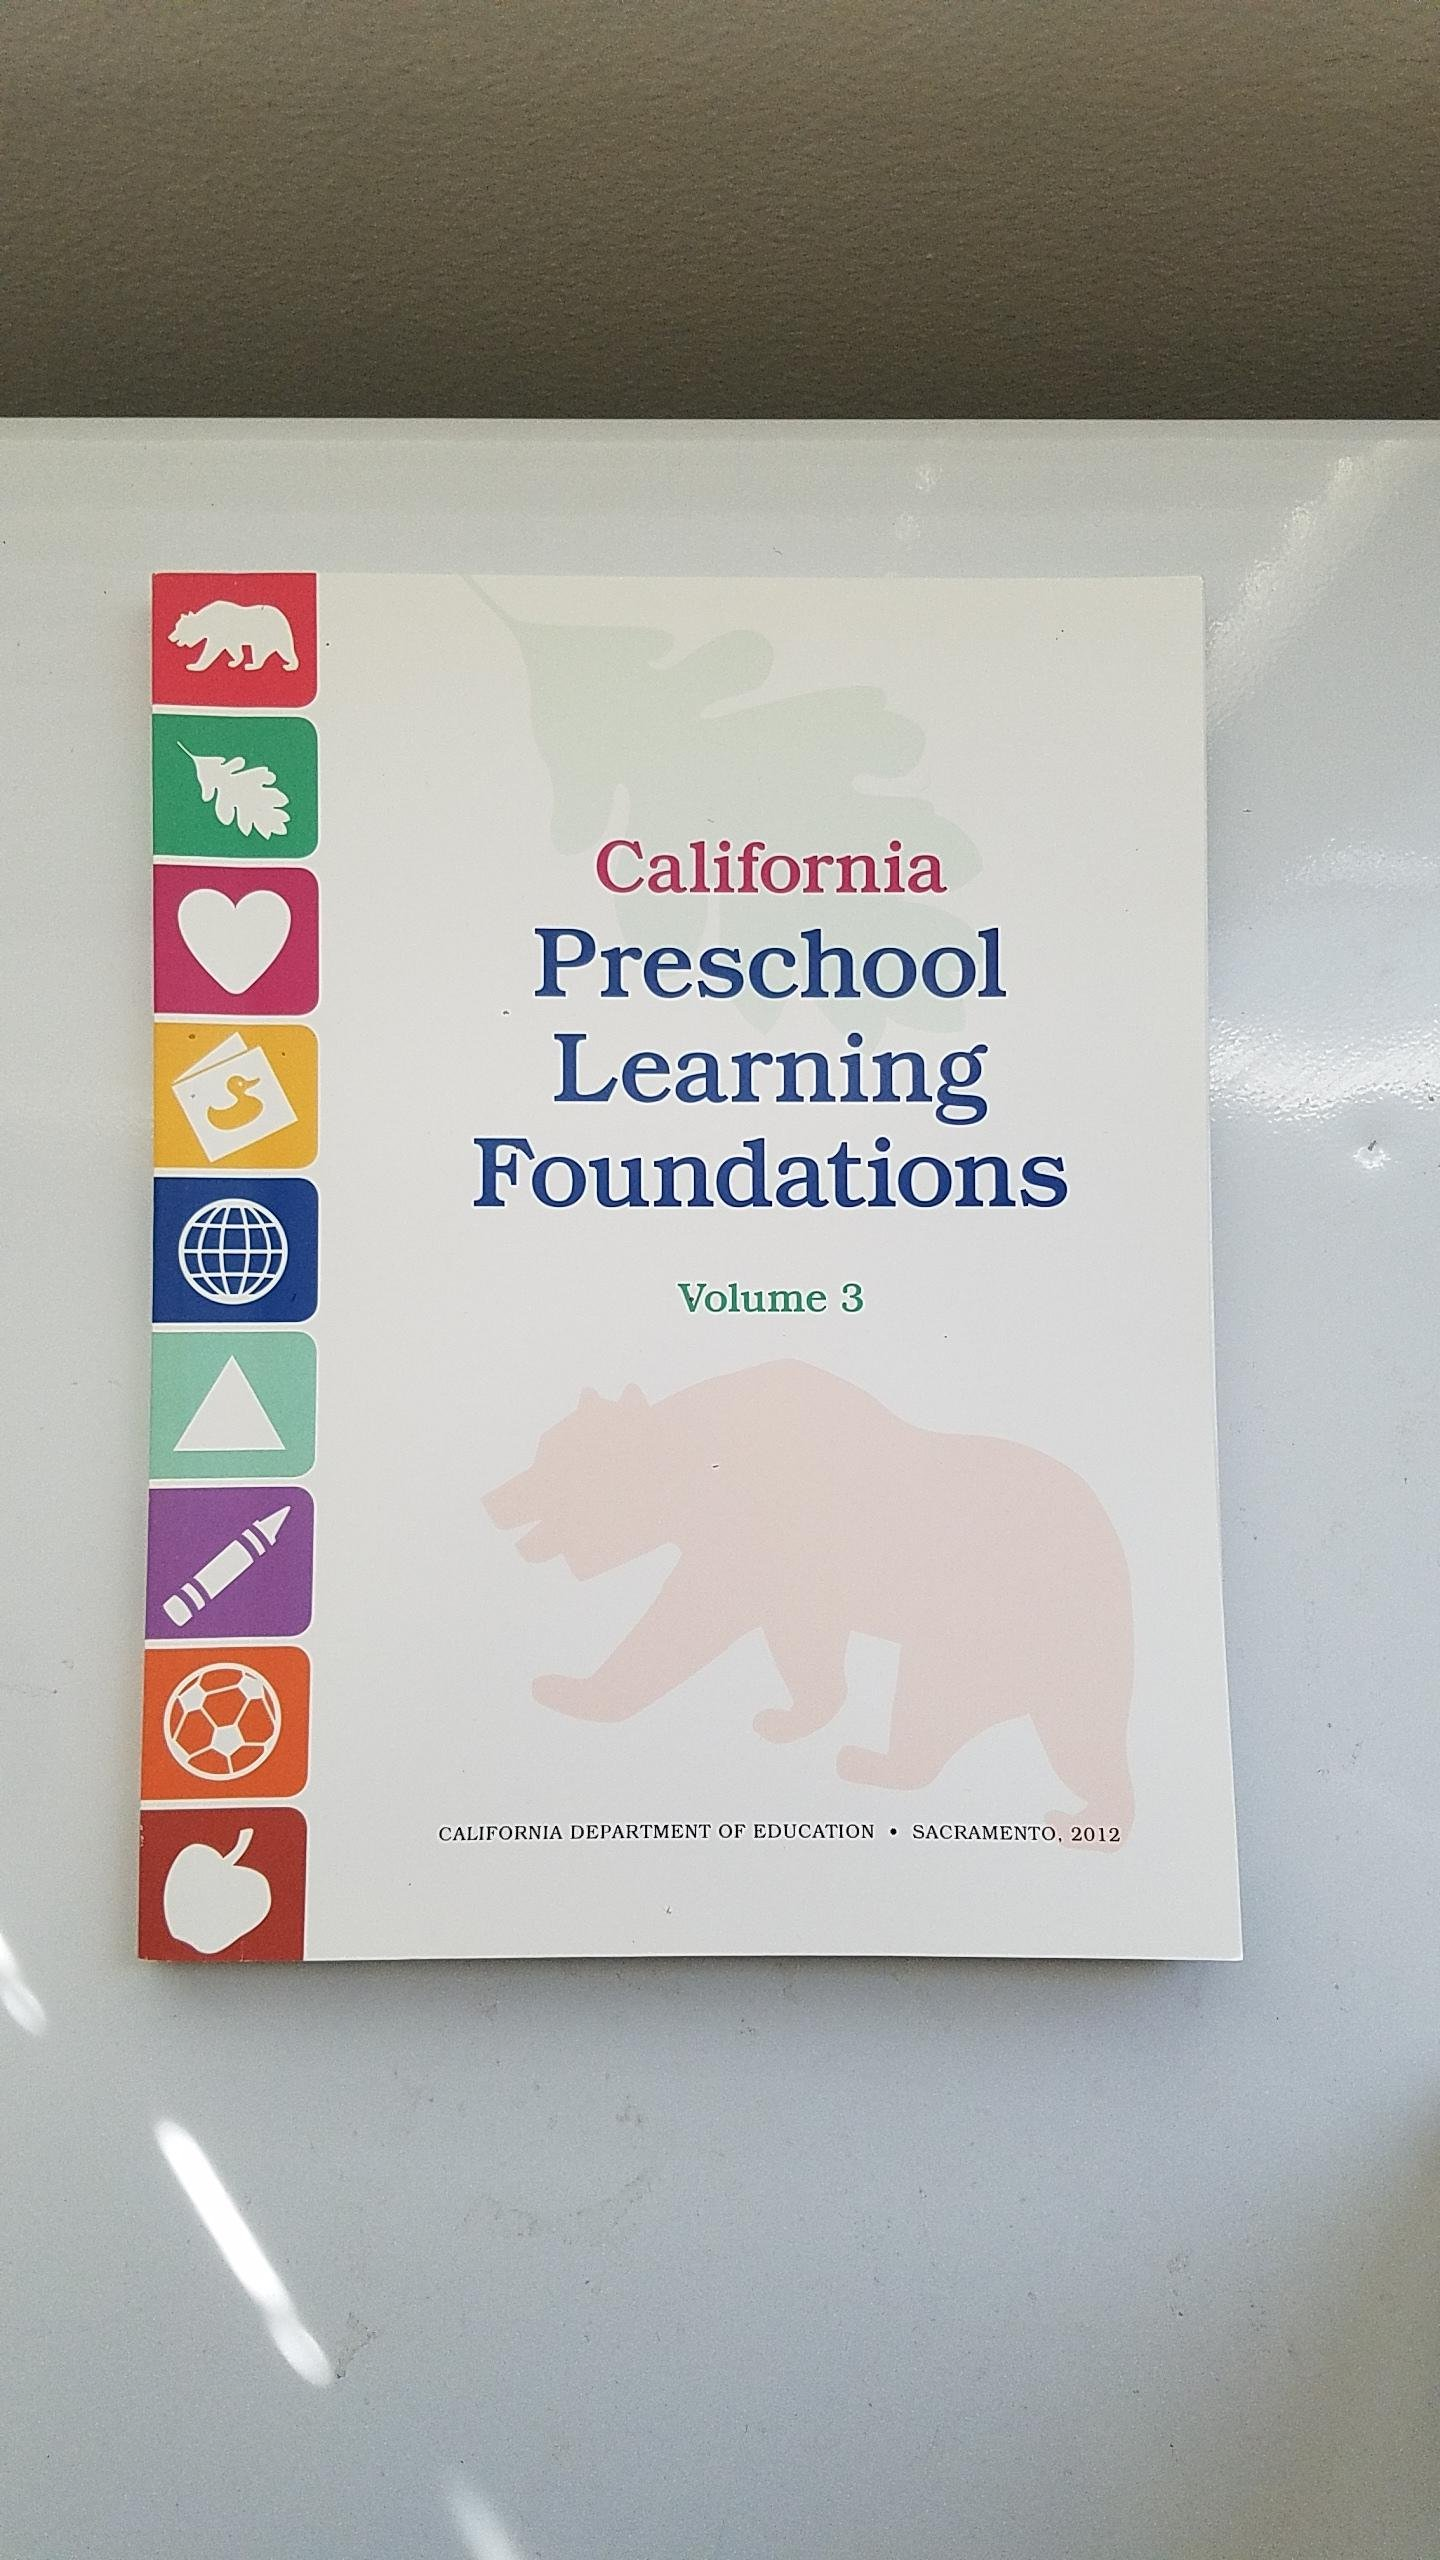 California preschool learning foundations volume 3 9780801117275 california preschool learning foundations volume 3 9780801117275 amazon books fandeluxe Gallery